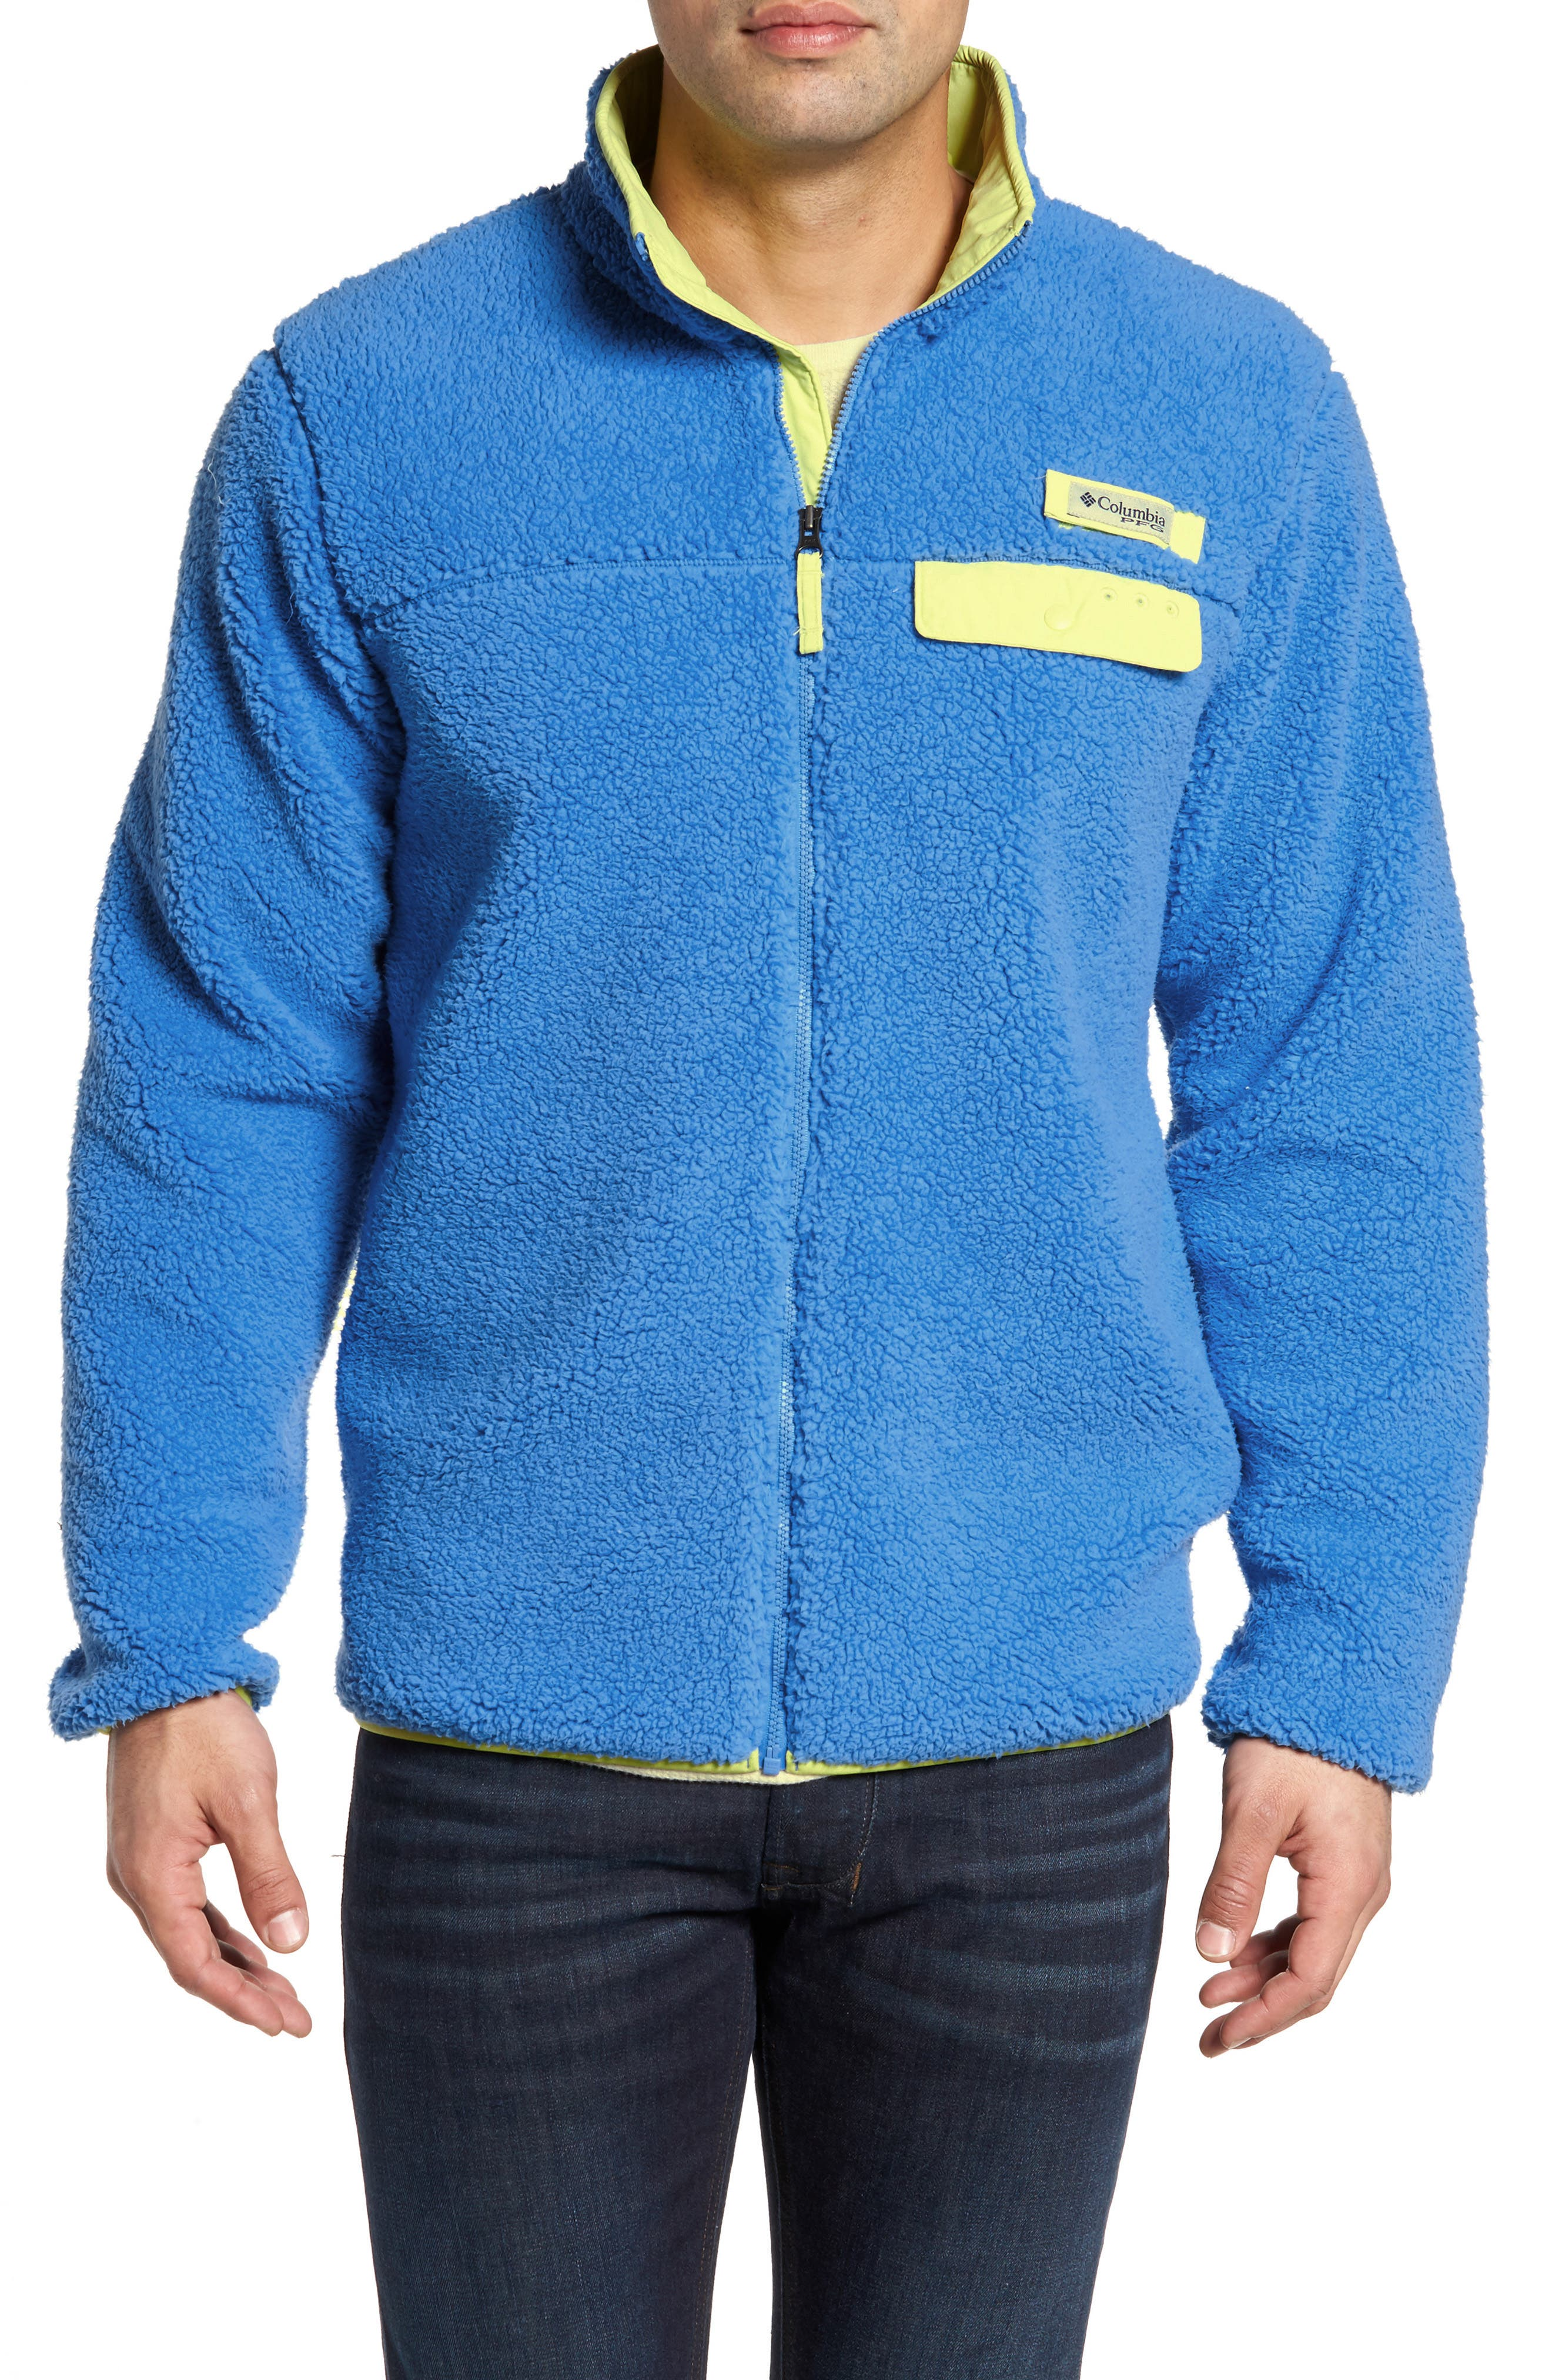 Harborside Fleece Jacket,                         Main,                         color, Harbor Blue/ Neon Light